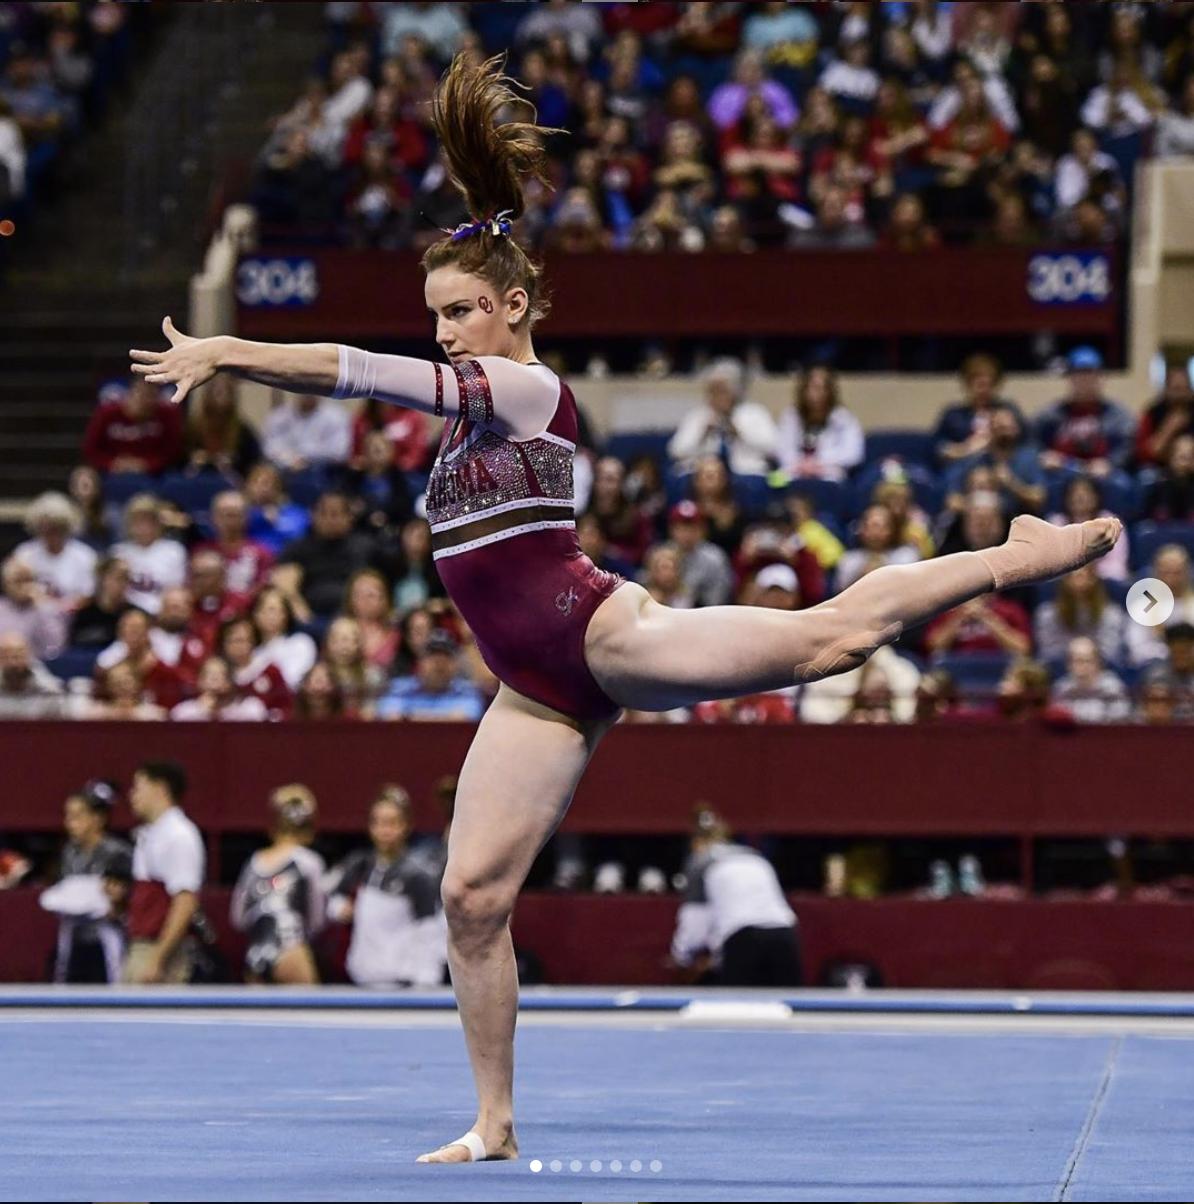 a gymnast dancing on the floor